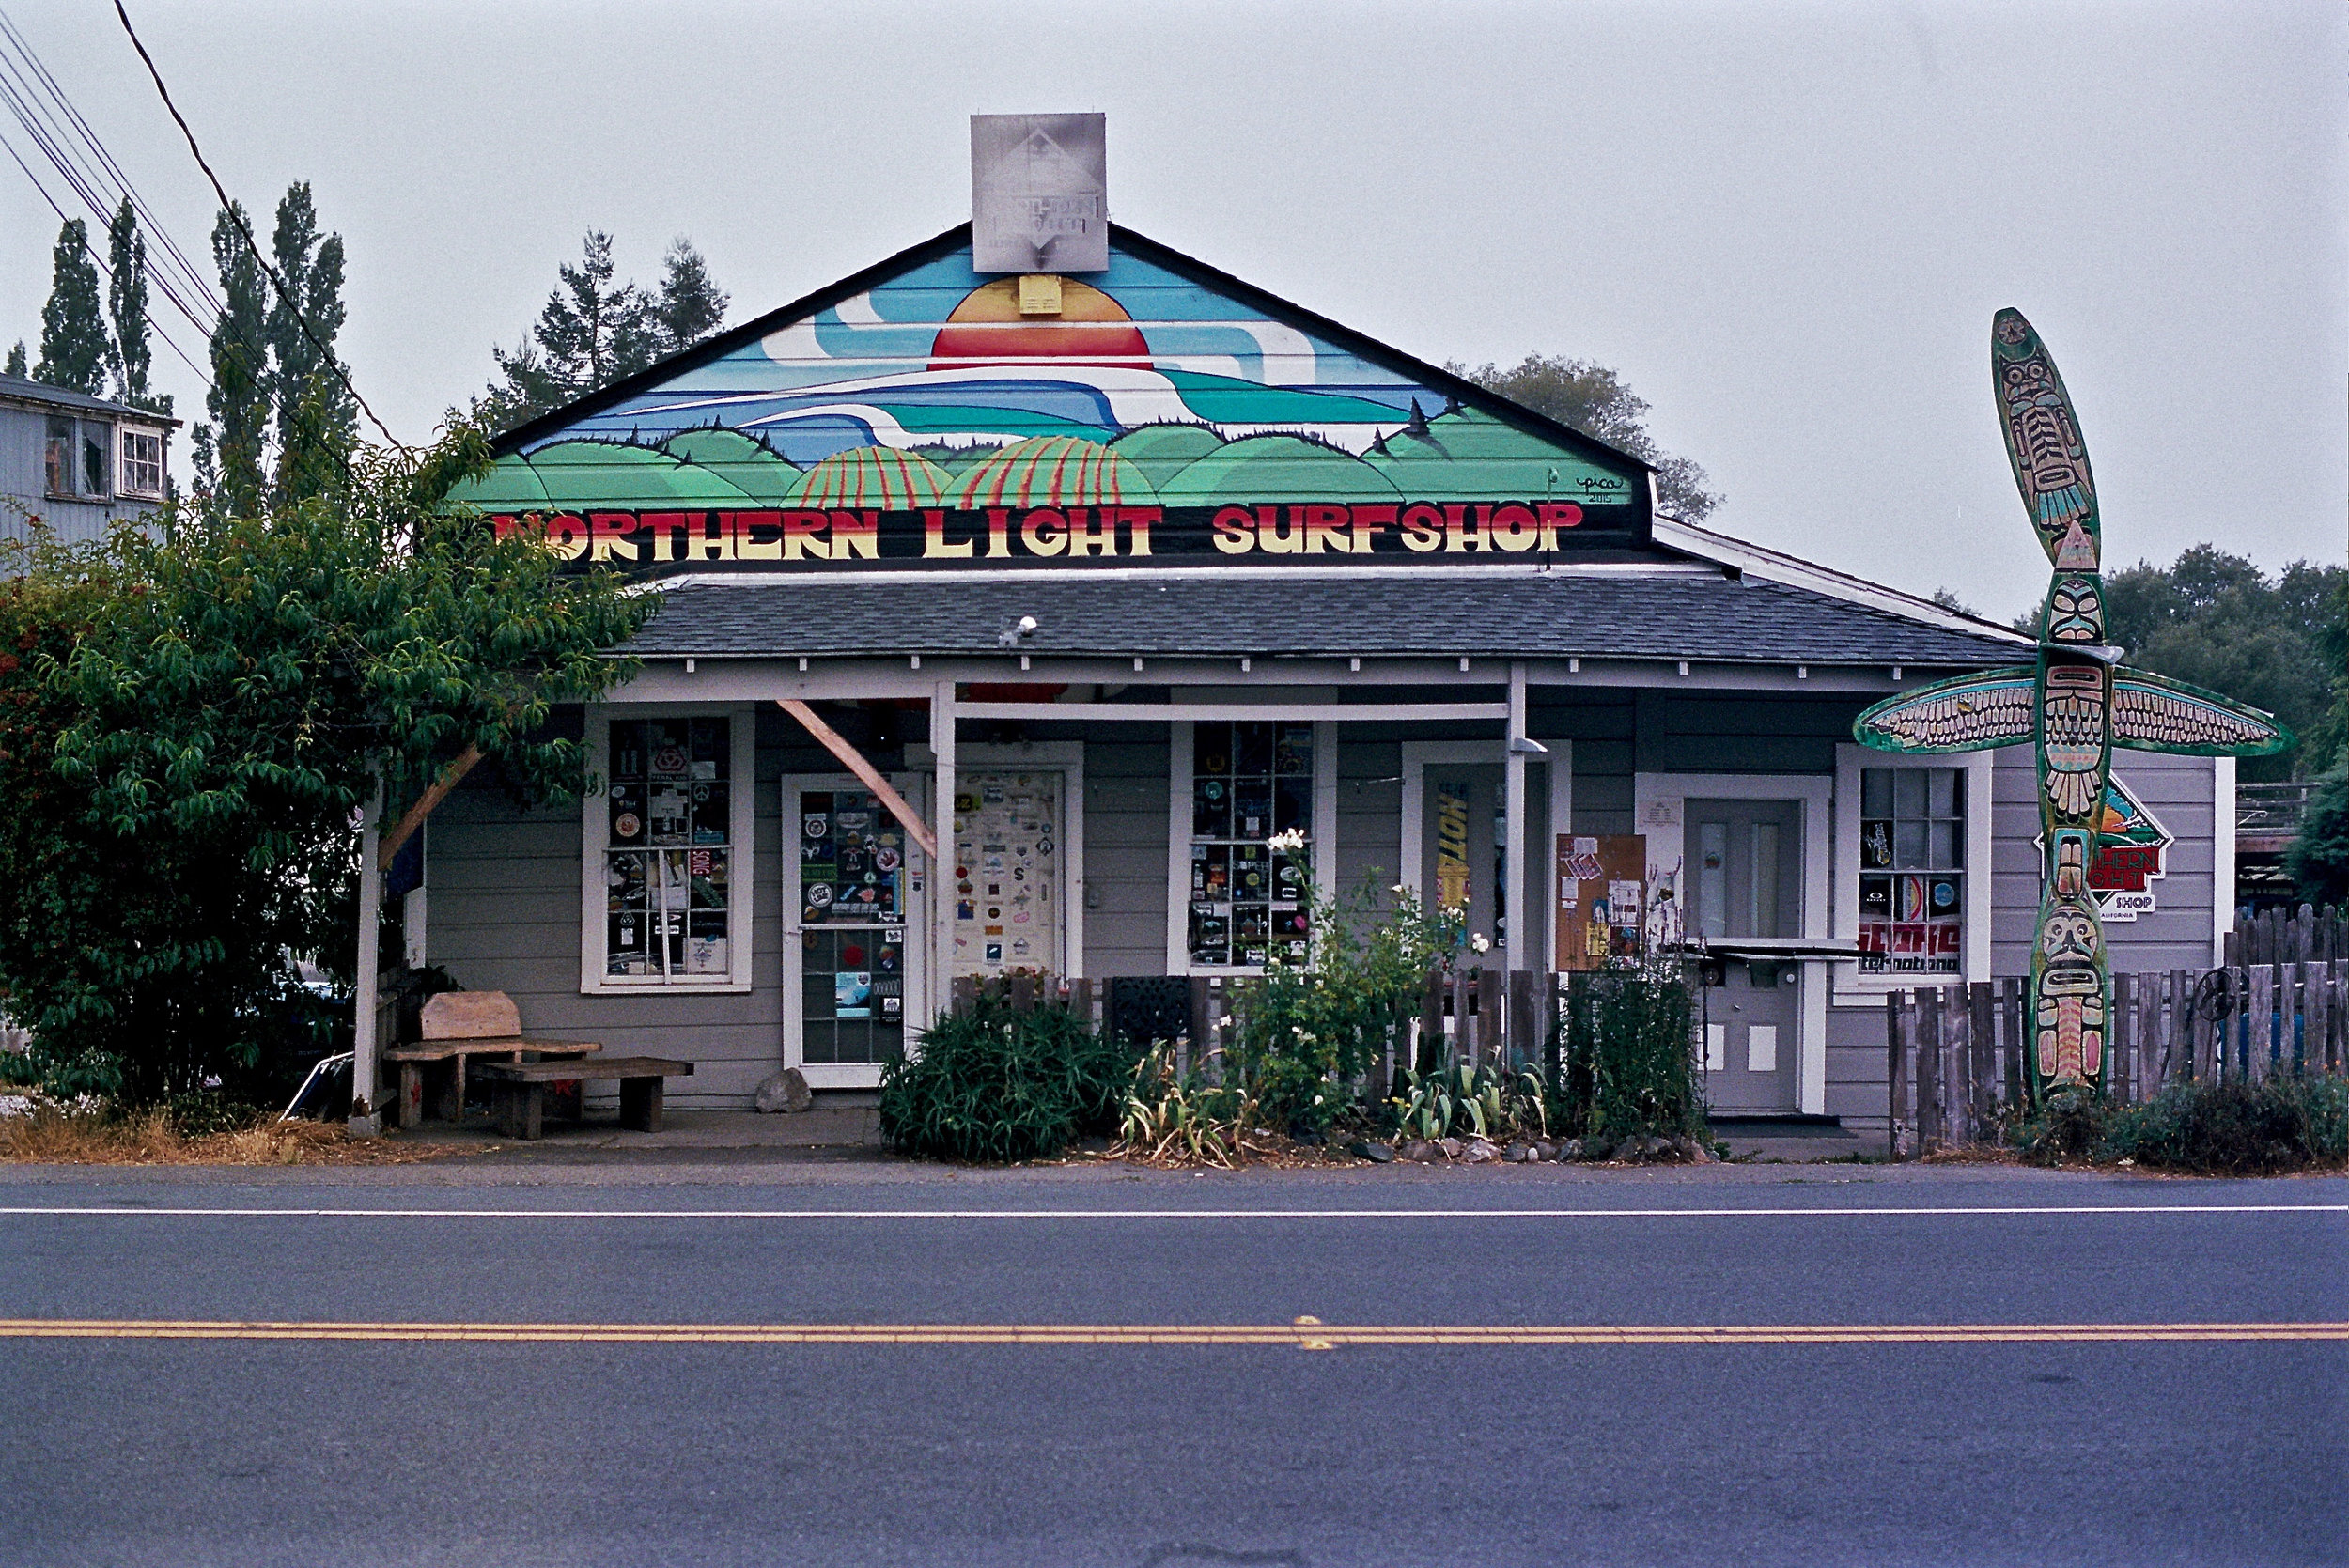 Surf Shop, Bodega, CA Olympus OM2n, 50mm f/1.4 Zuiko on Kodak Portra 400